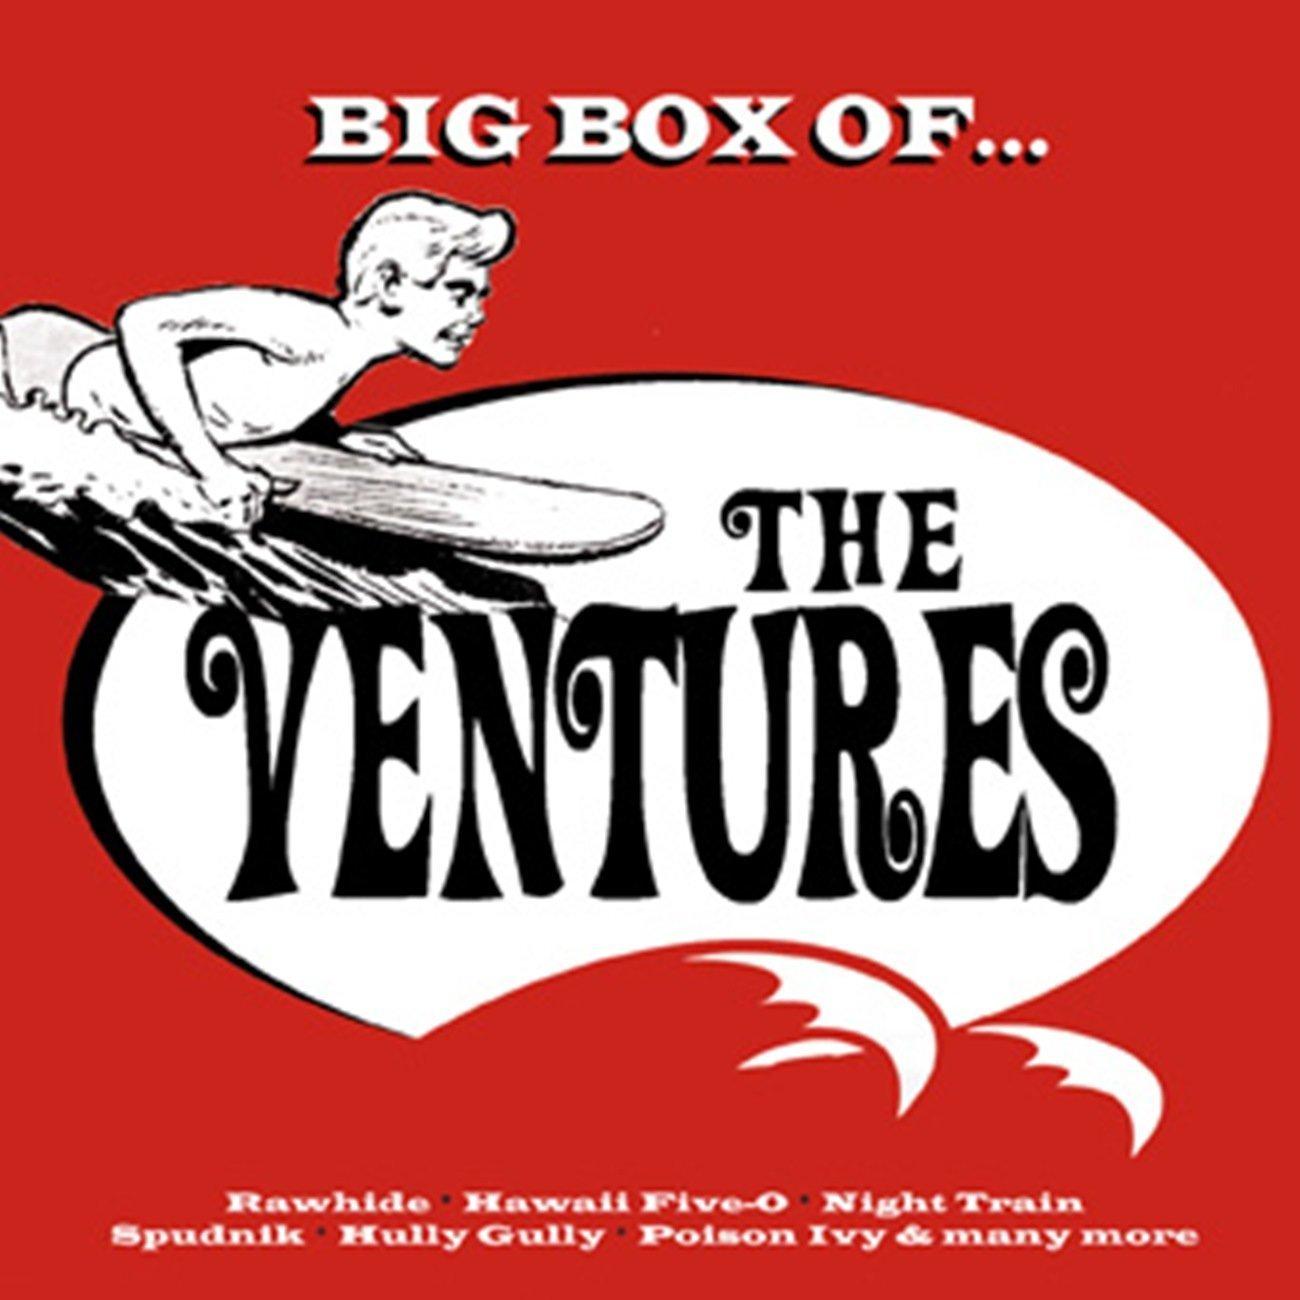 The Ventures - Big Box of The Ventures [6CD Box Set] (2013) [CD FLAC] Download